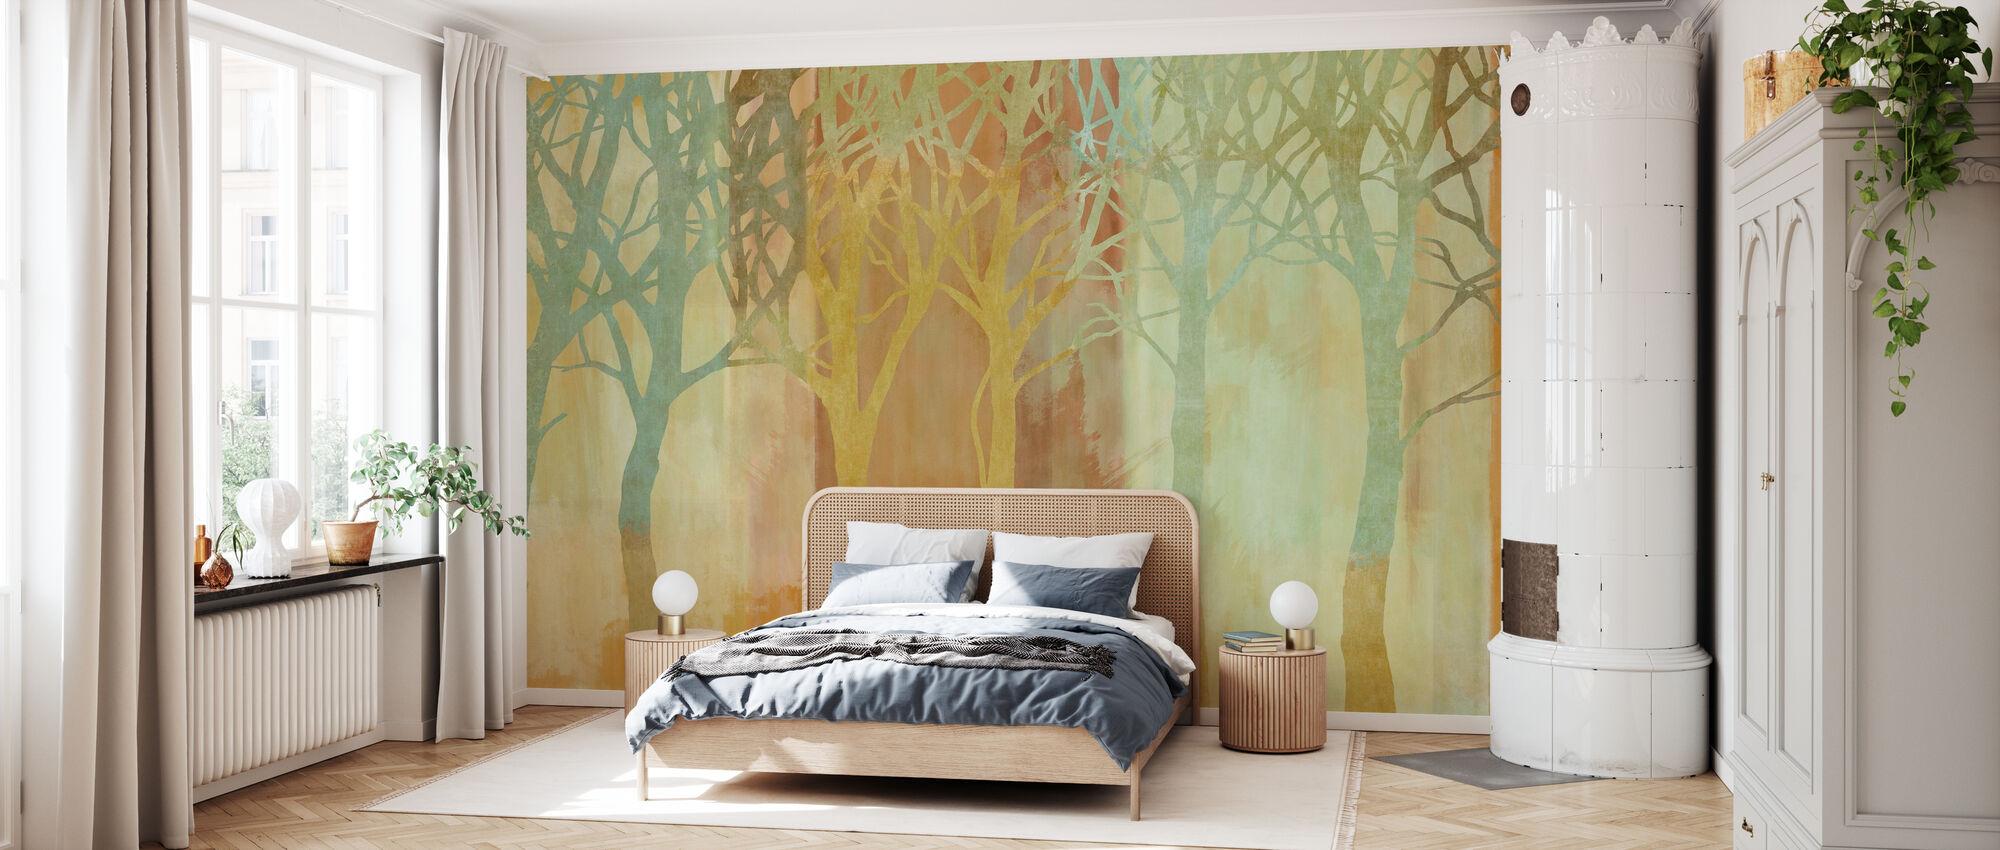 Row of Trees - Wallpaper - Bedroom